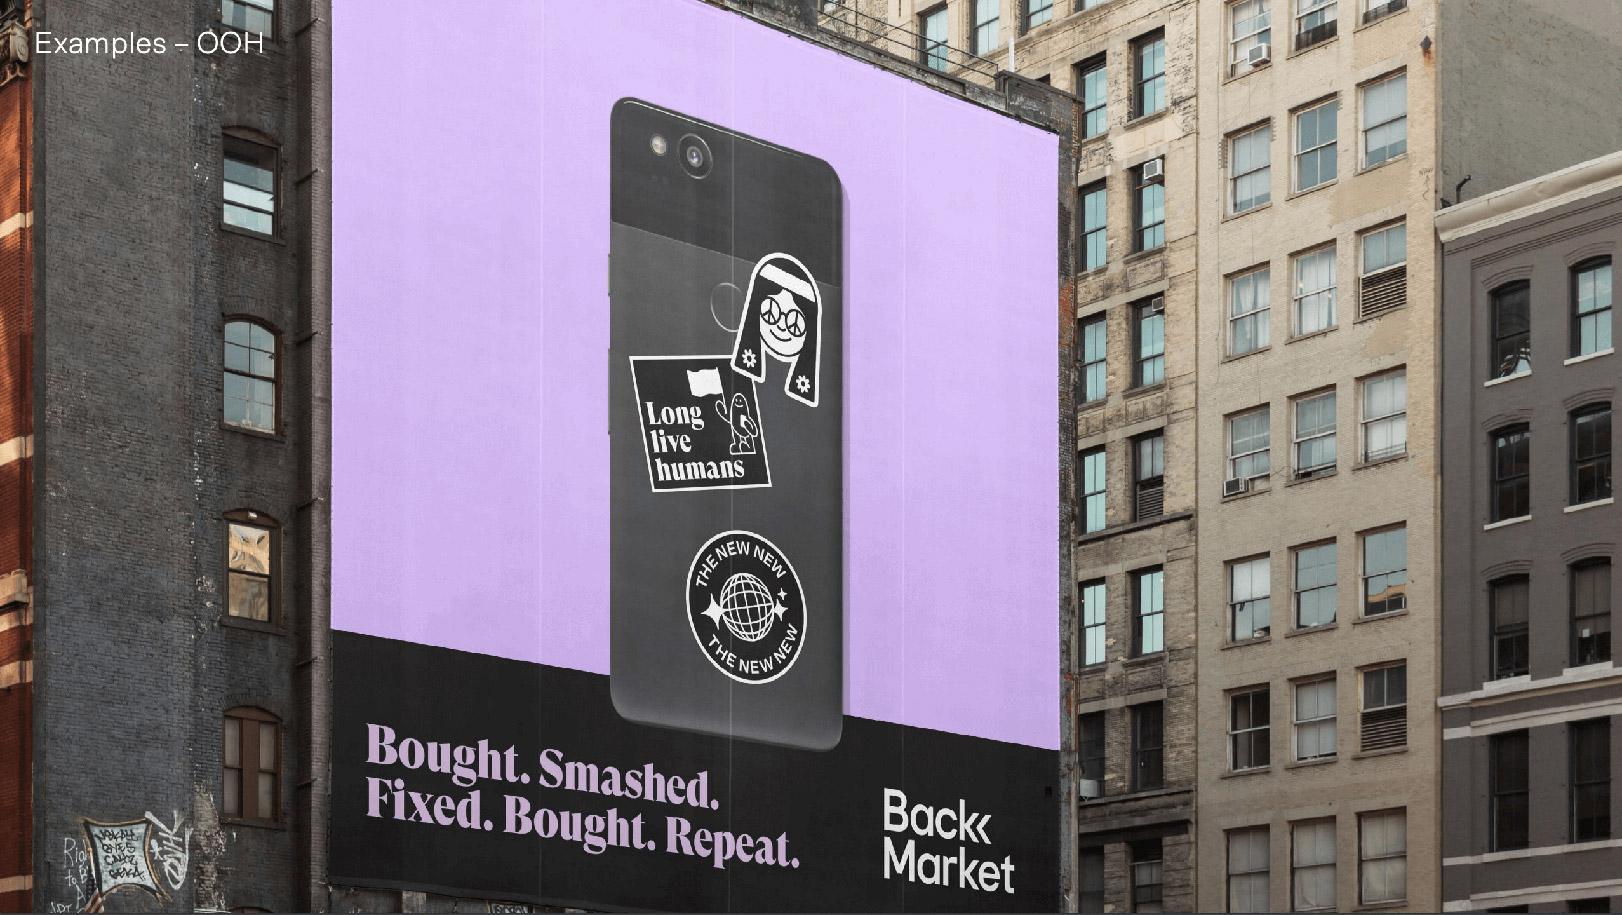 Campagne d'affichage de Back Market à New York